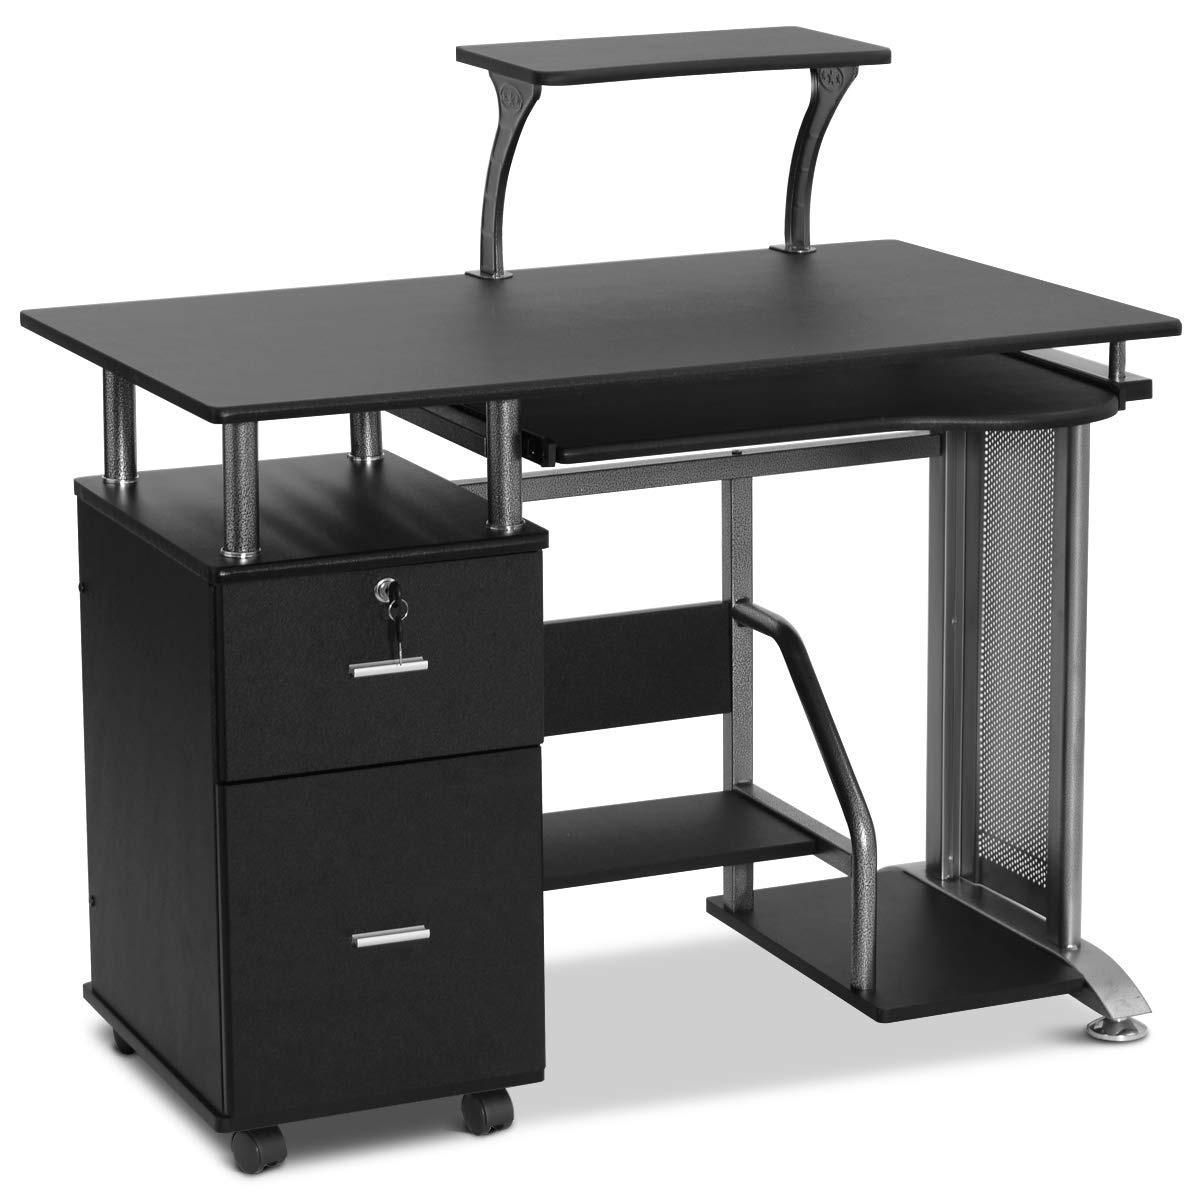 Black Computer Desk With Printer Shelf On Sale Overstock 28423238